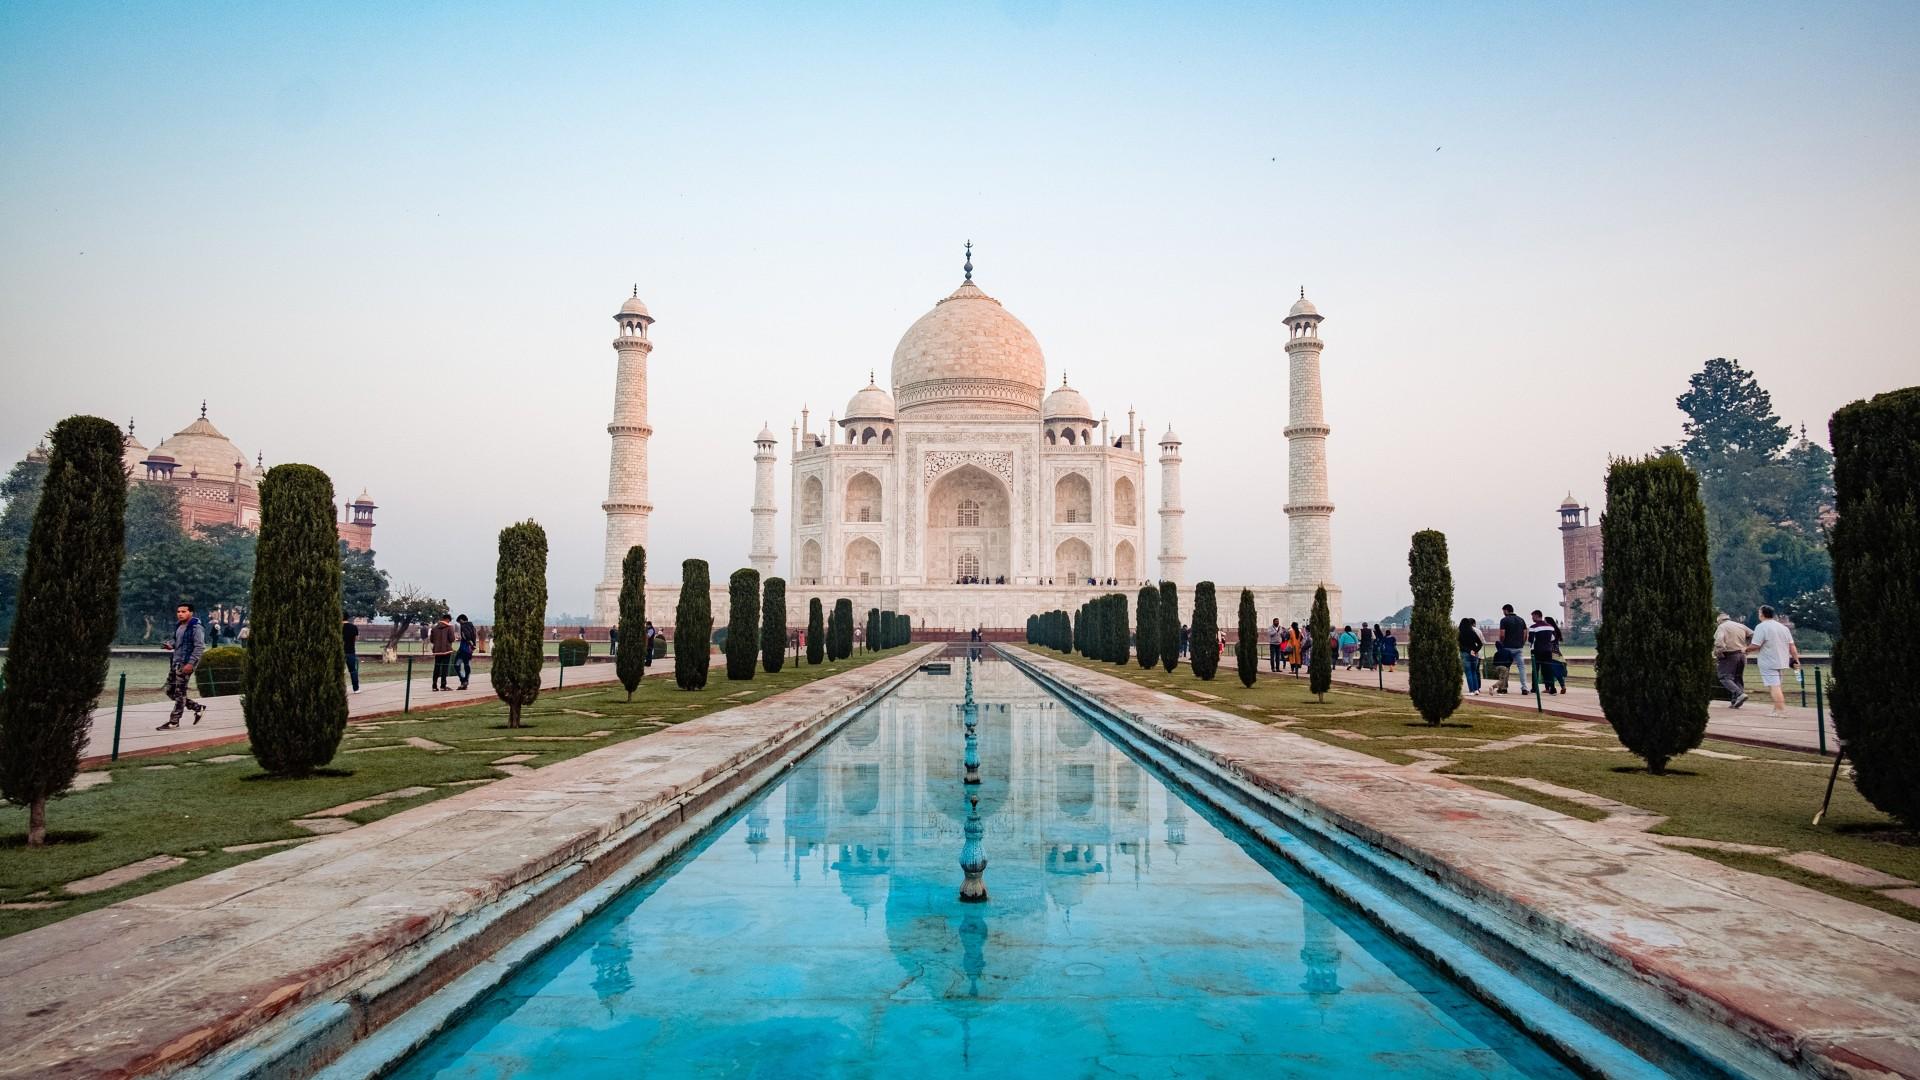 Wallpaper 3d Android Taj Mahal Agra India 4k Wallpapers Hd Wallpapers Id 27067